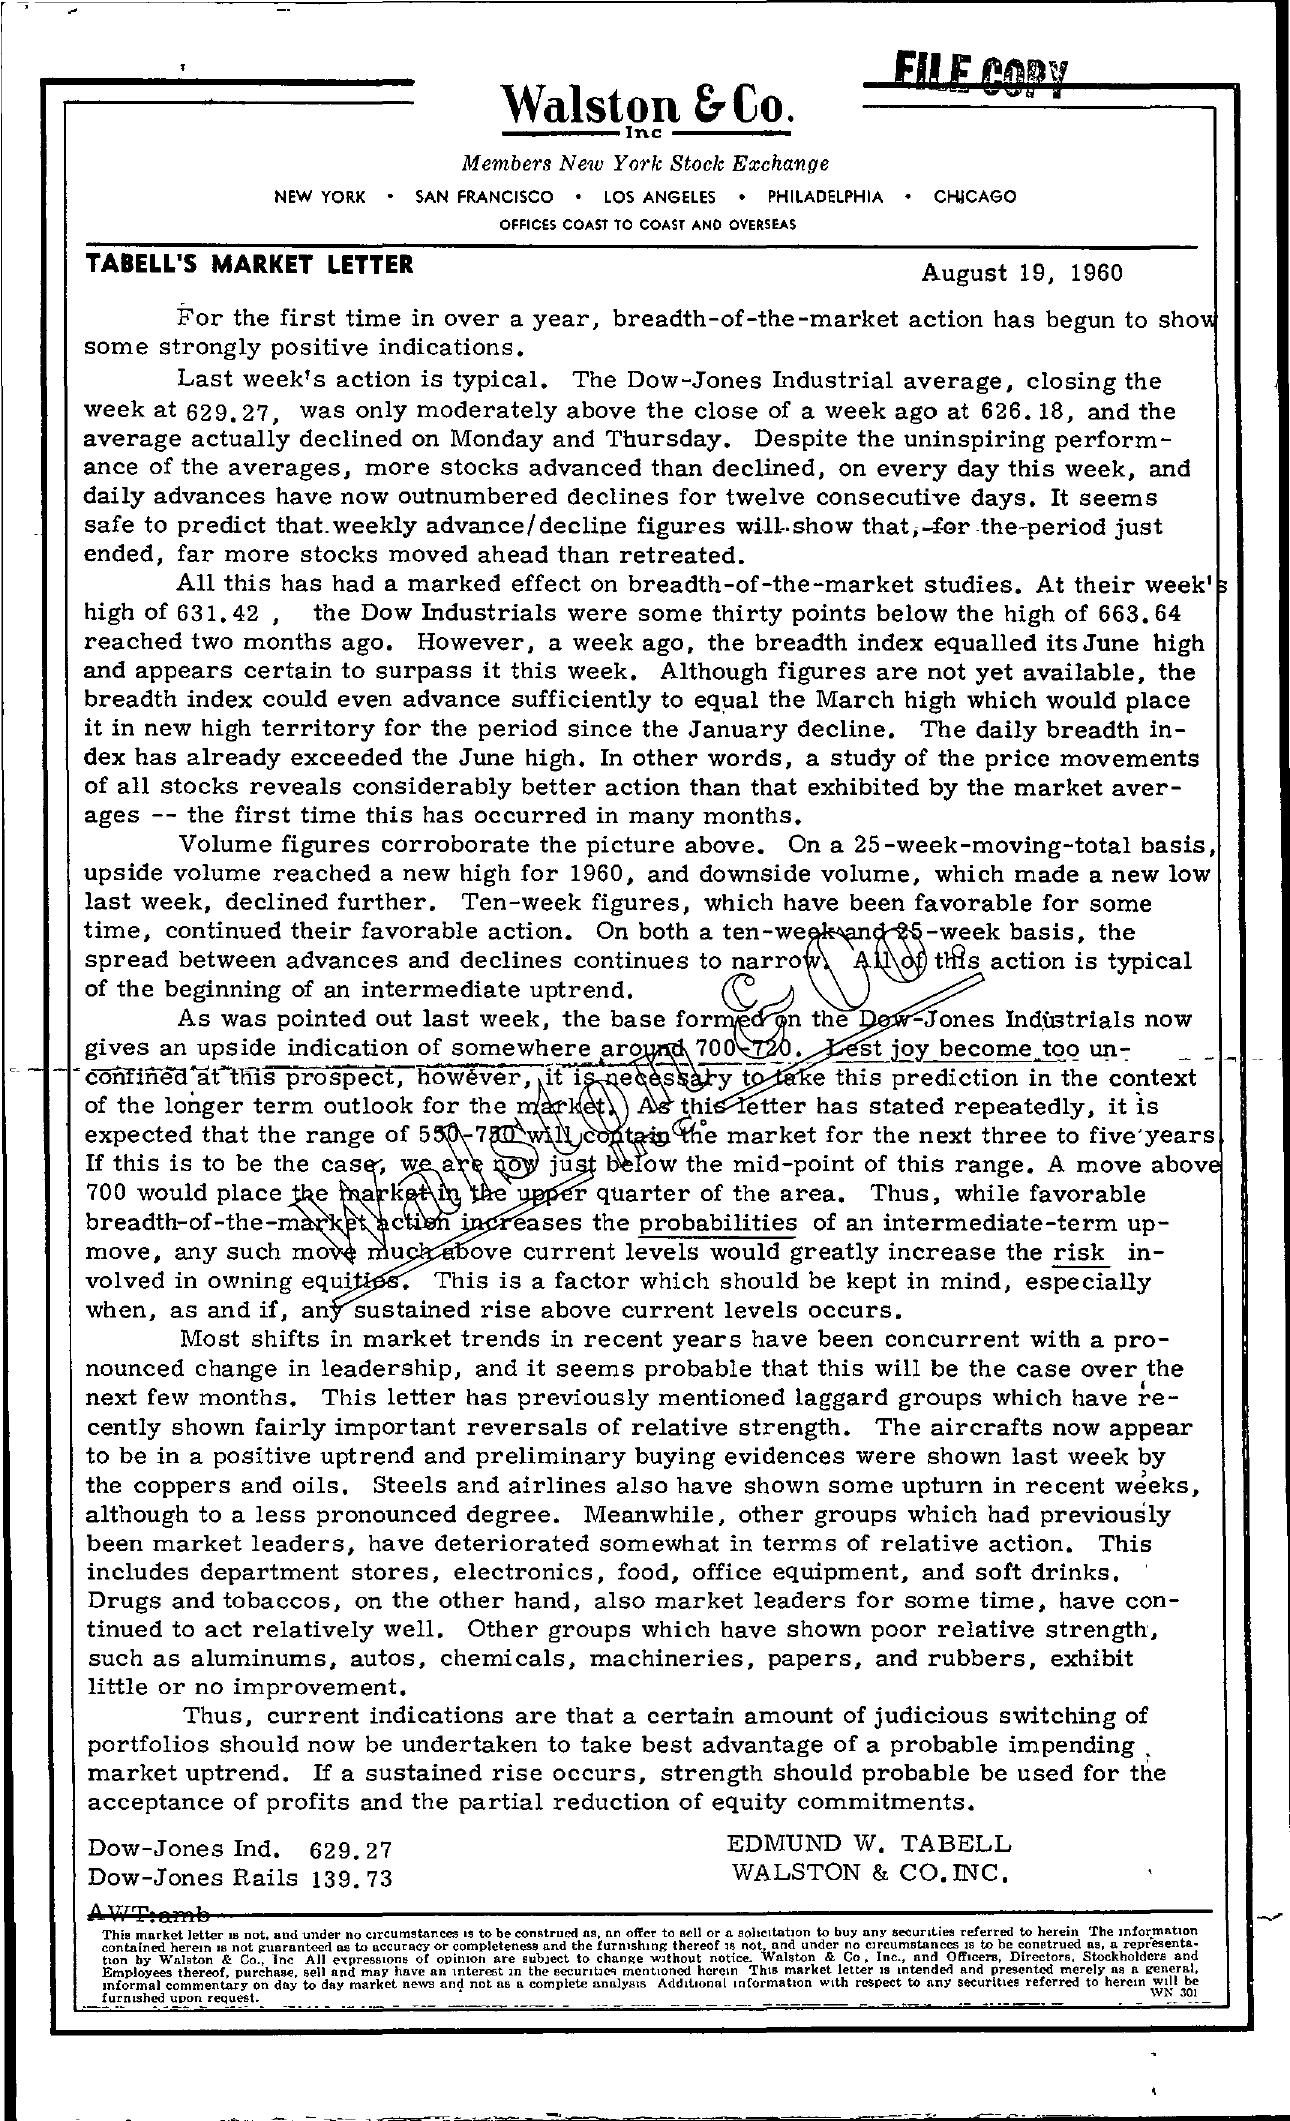 Tabell's Market Letter - August 19, 1960